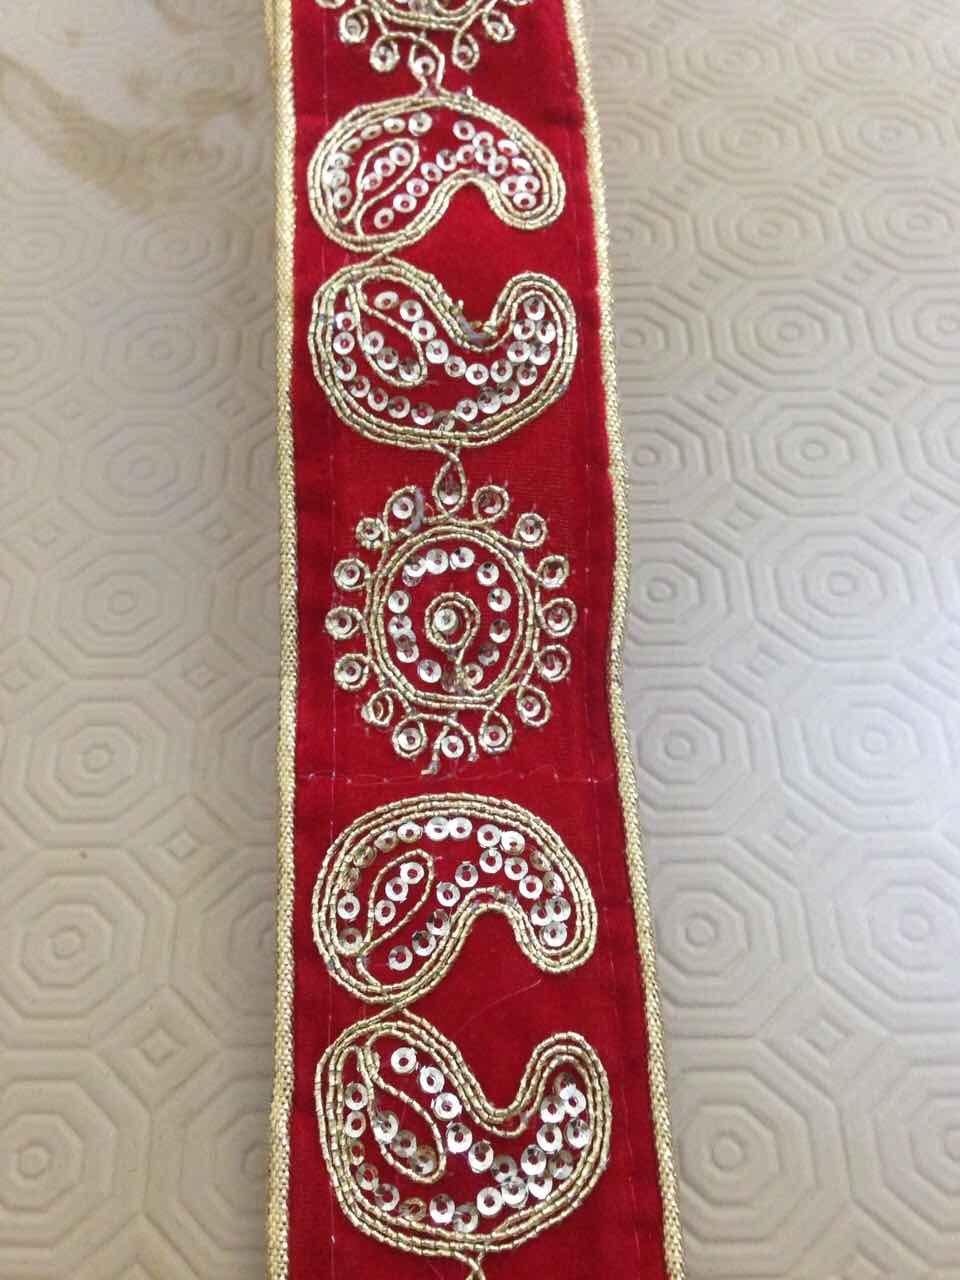 Fancy Gold Sequin Lace Trim Bridal Wedding Ribbon Craft Sari Border 4cm x 1Yard RED